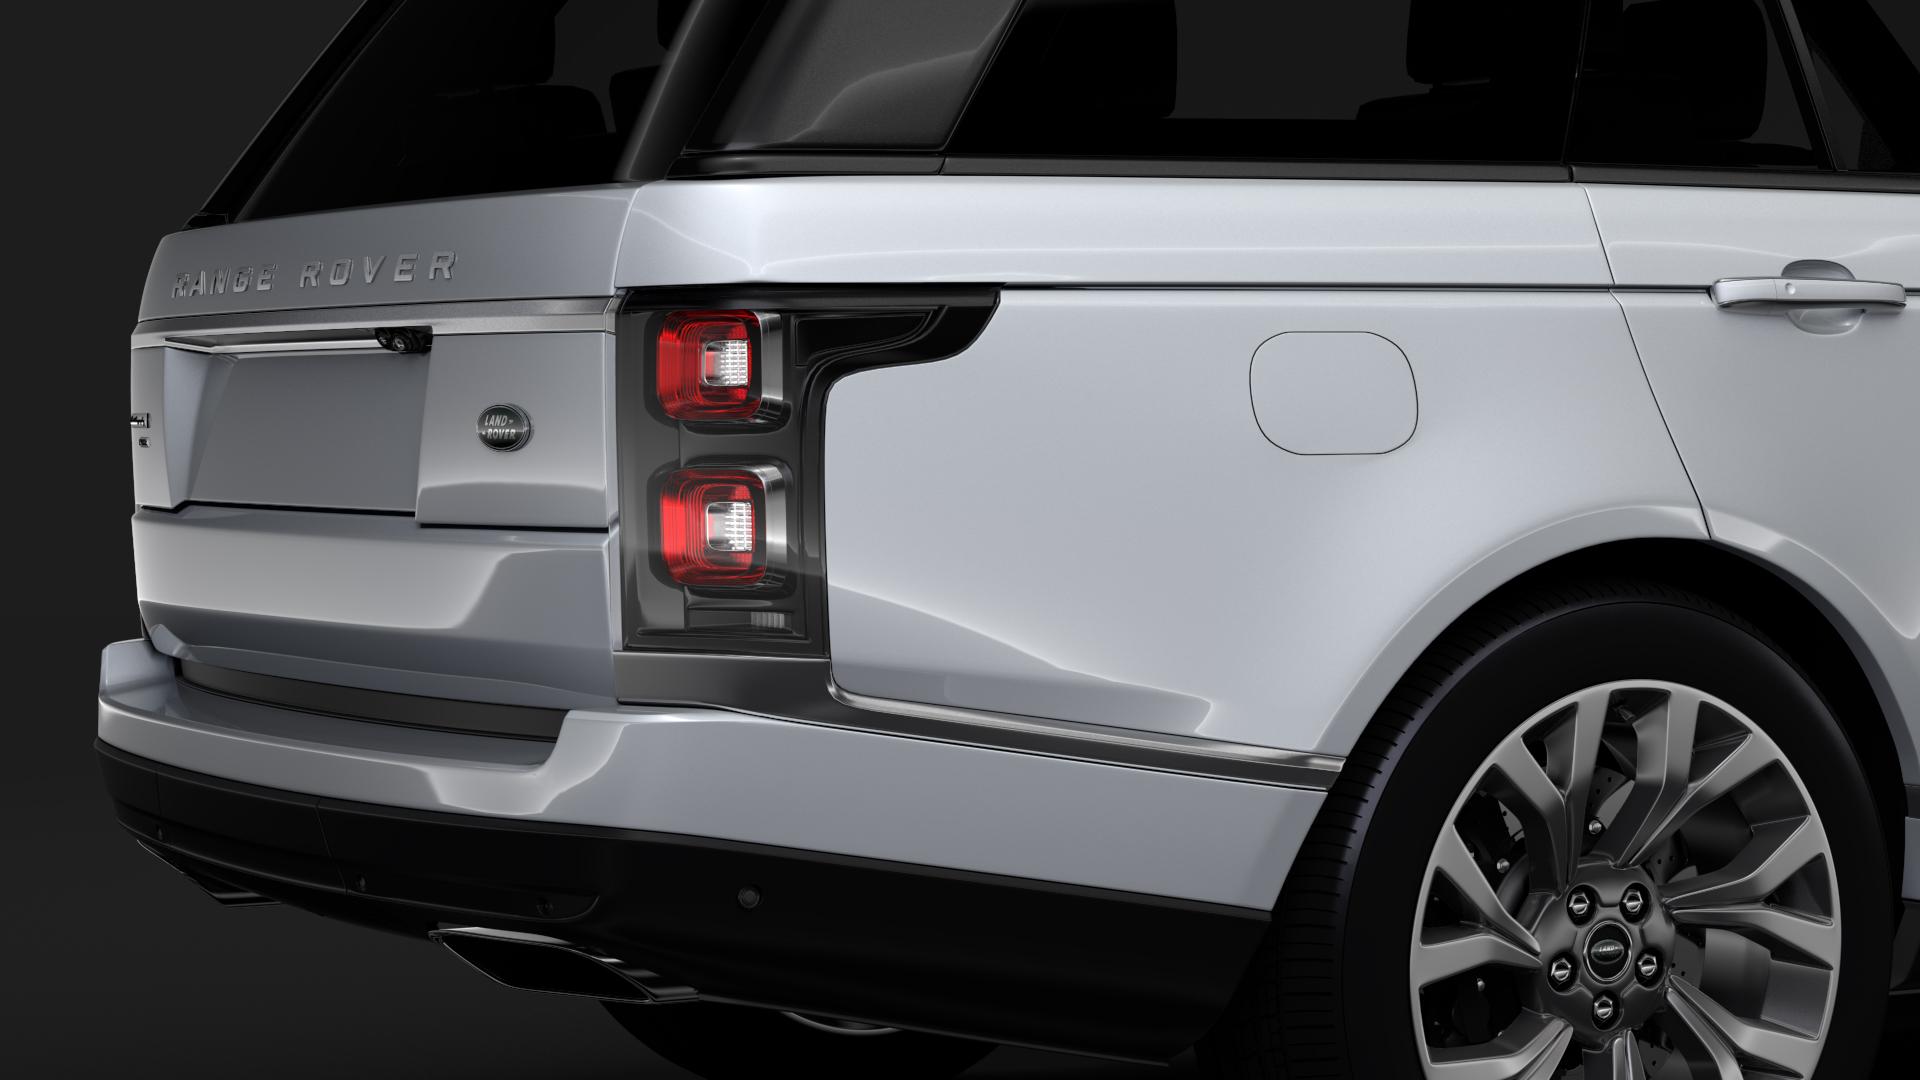 range rover autobiography p400e lwb l405 2018 3d model fbx c4d lwo ma mb hrc xsi obj 277359